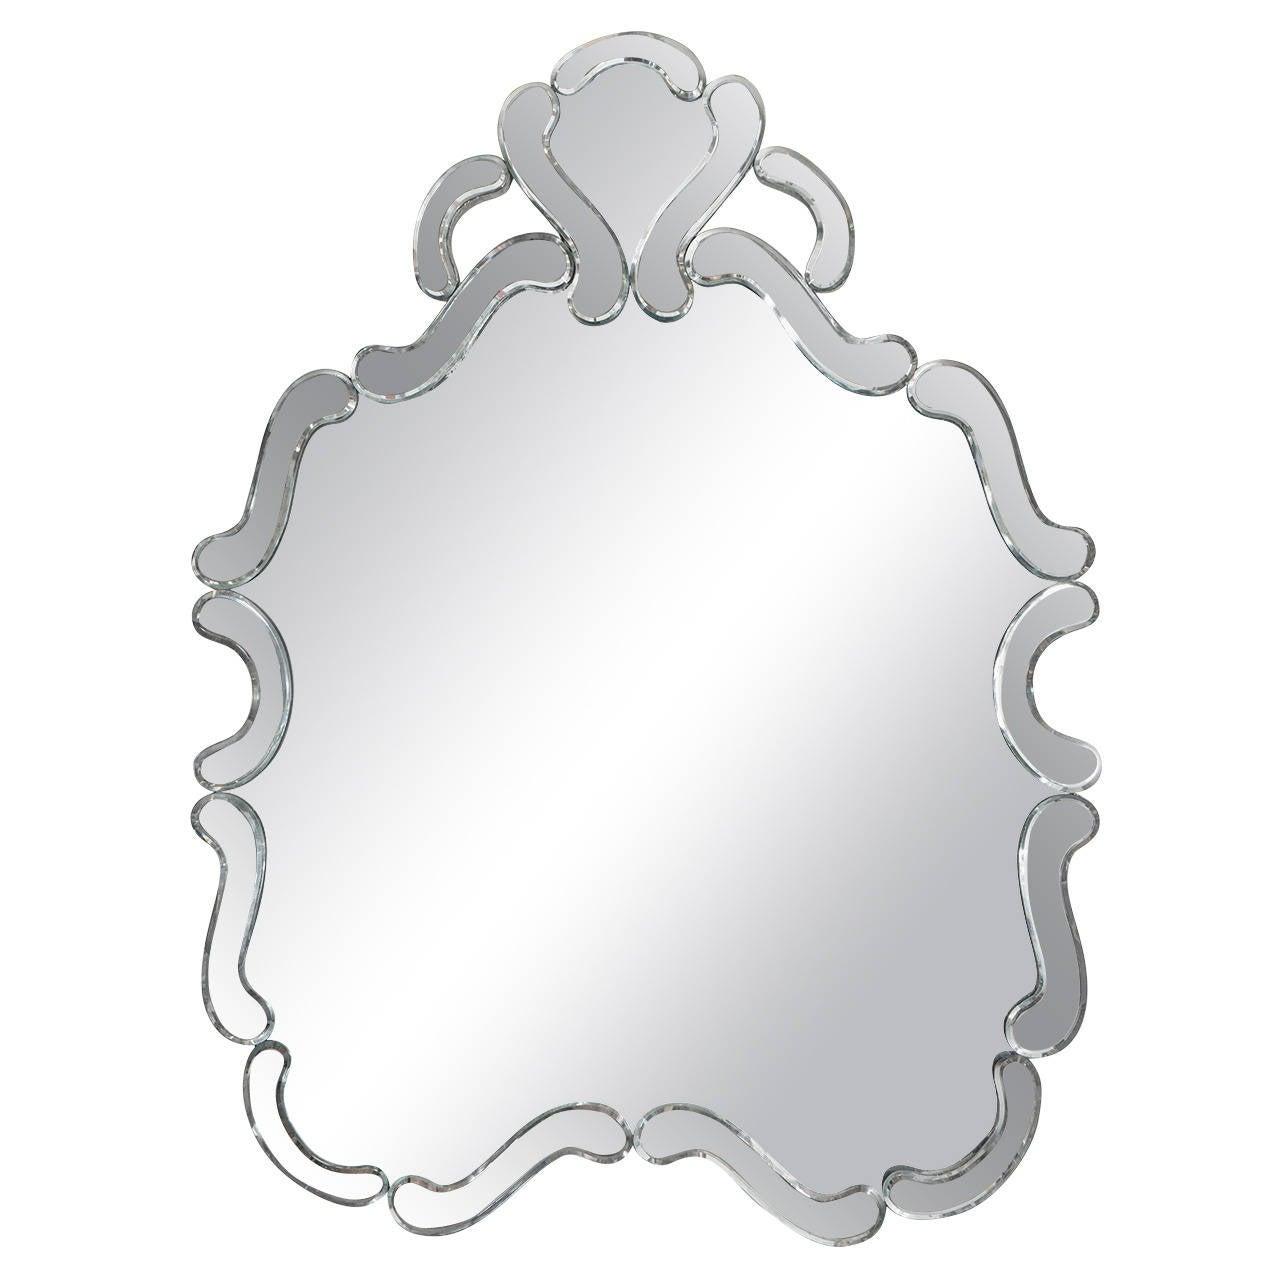 Italian Midcentury Decorative Venetian Wall Mirror